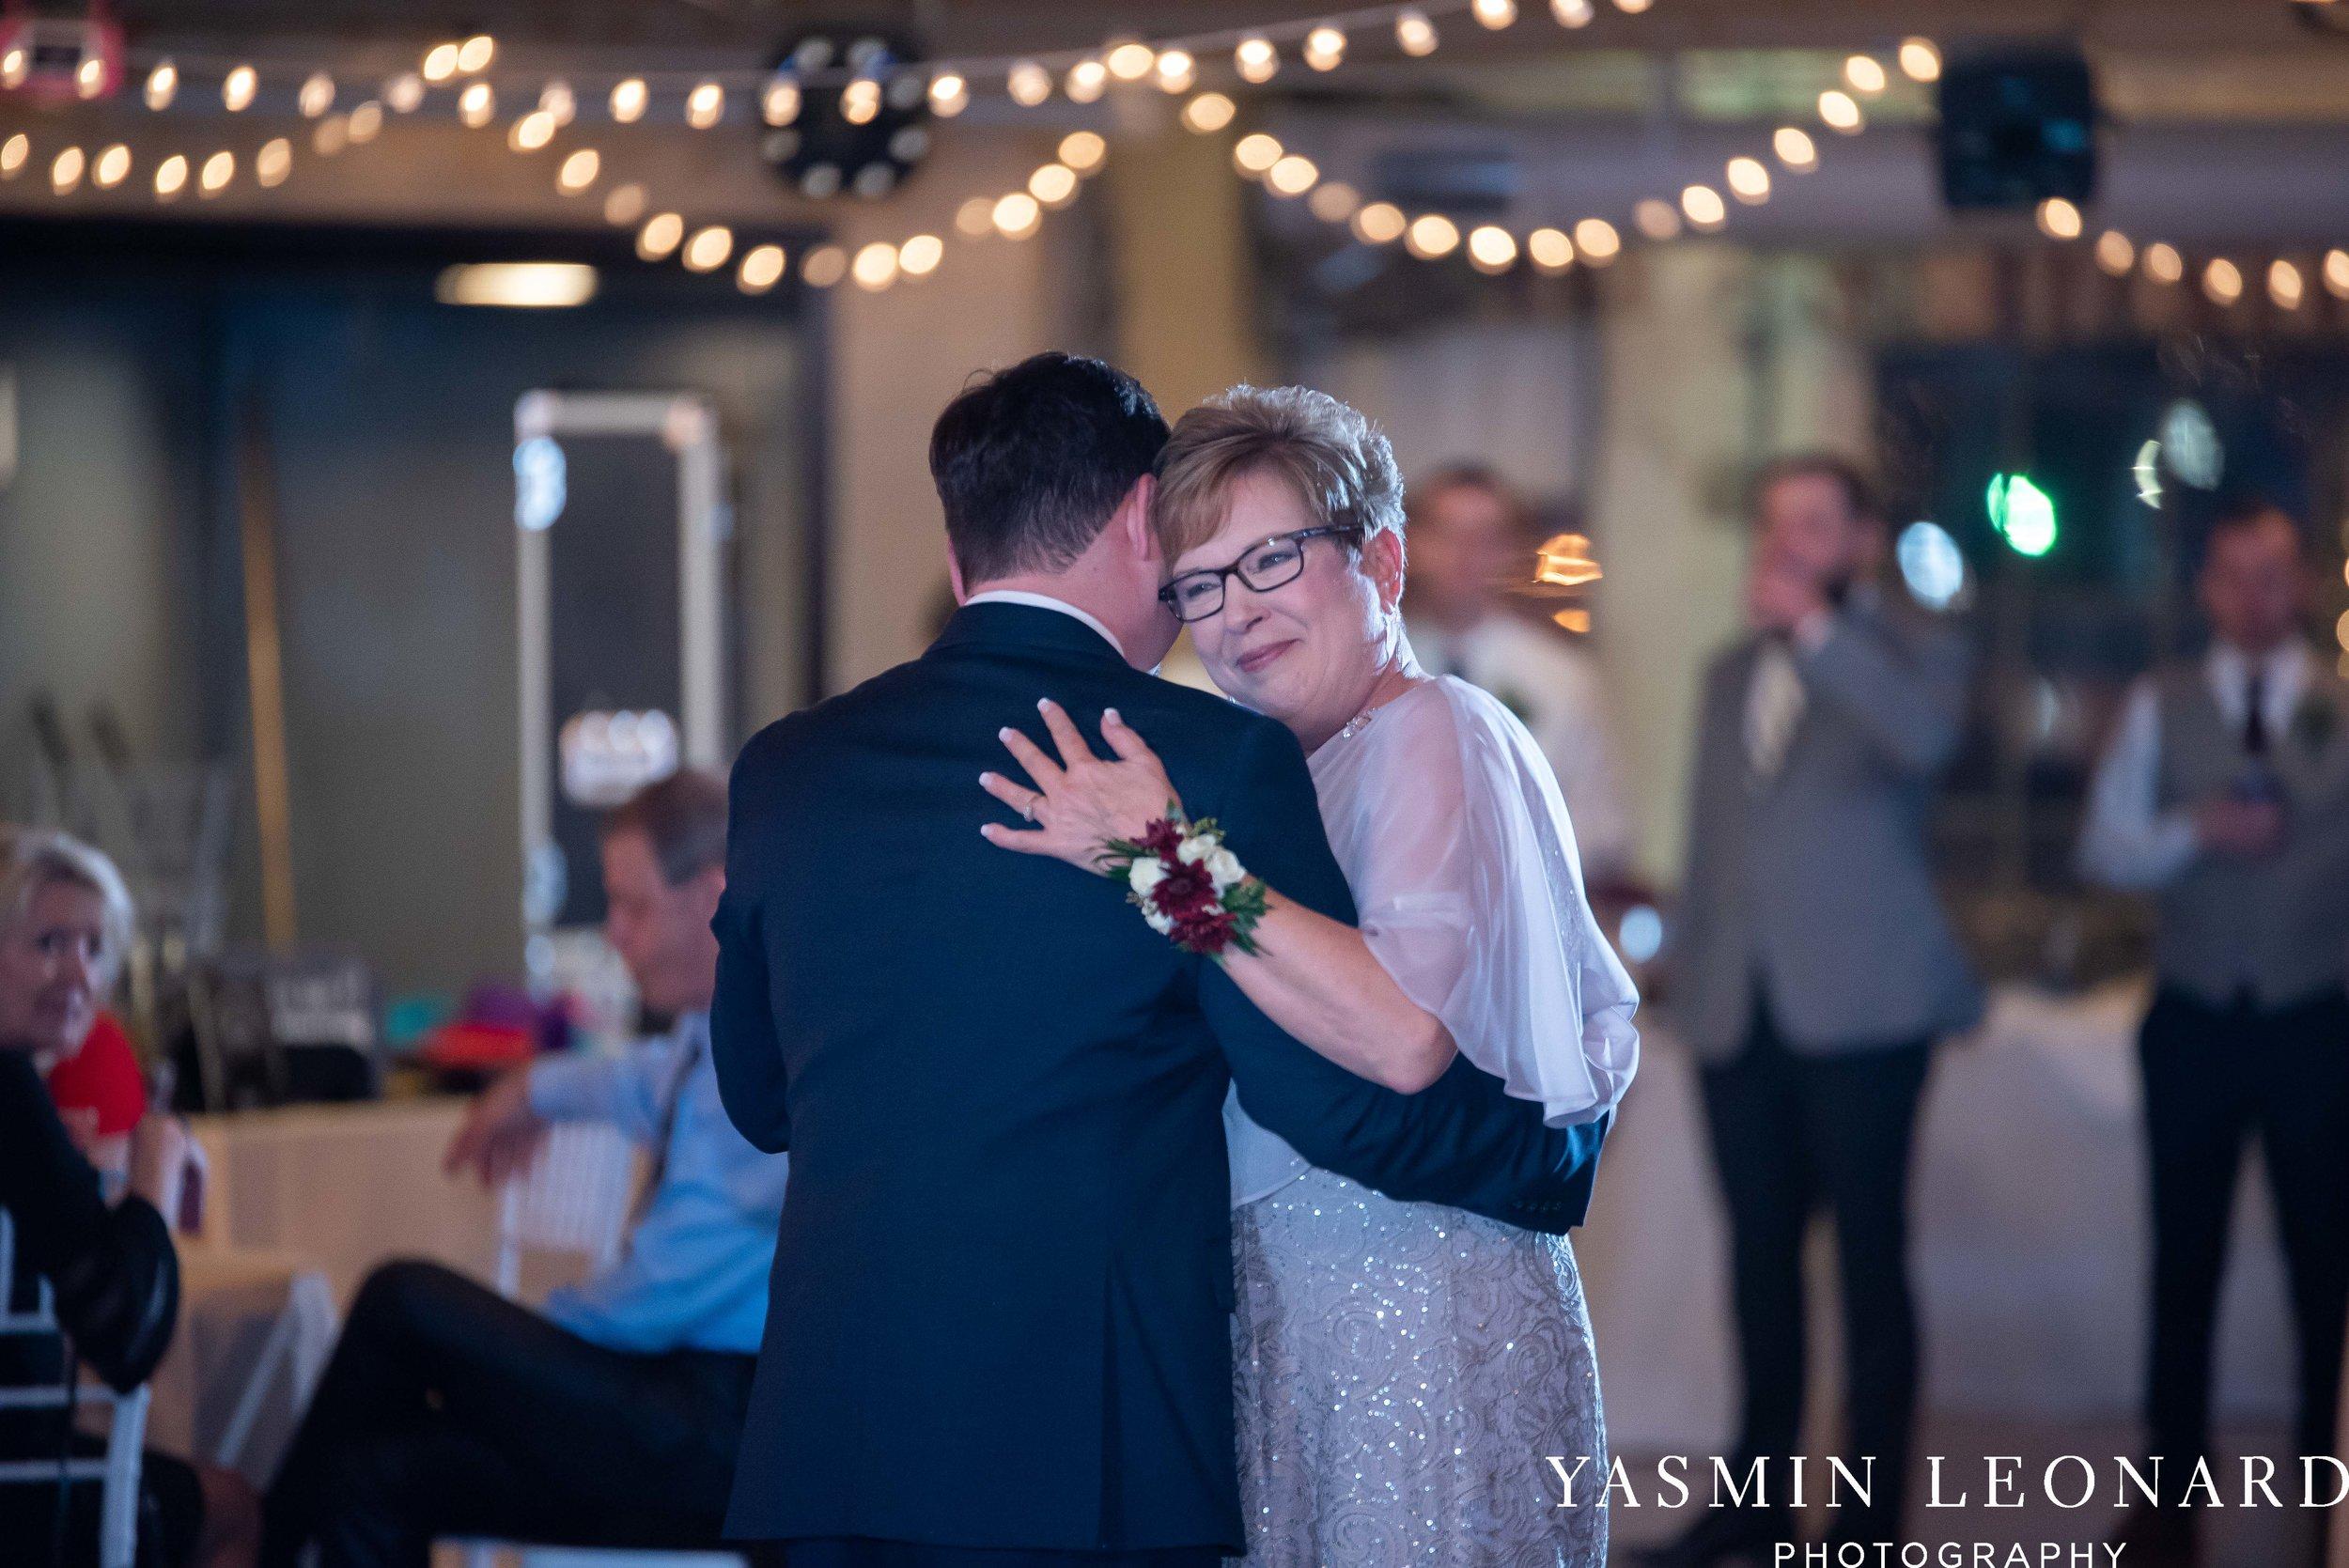 Rebekah and Matt - 105 Worth Event Centre - Yasmin Leonard Photography - Asheboro Wedding - NC Wedding - High Point Weddings - Triad Weddings - Winter Wedding-54.jpg